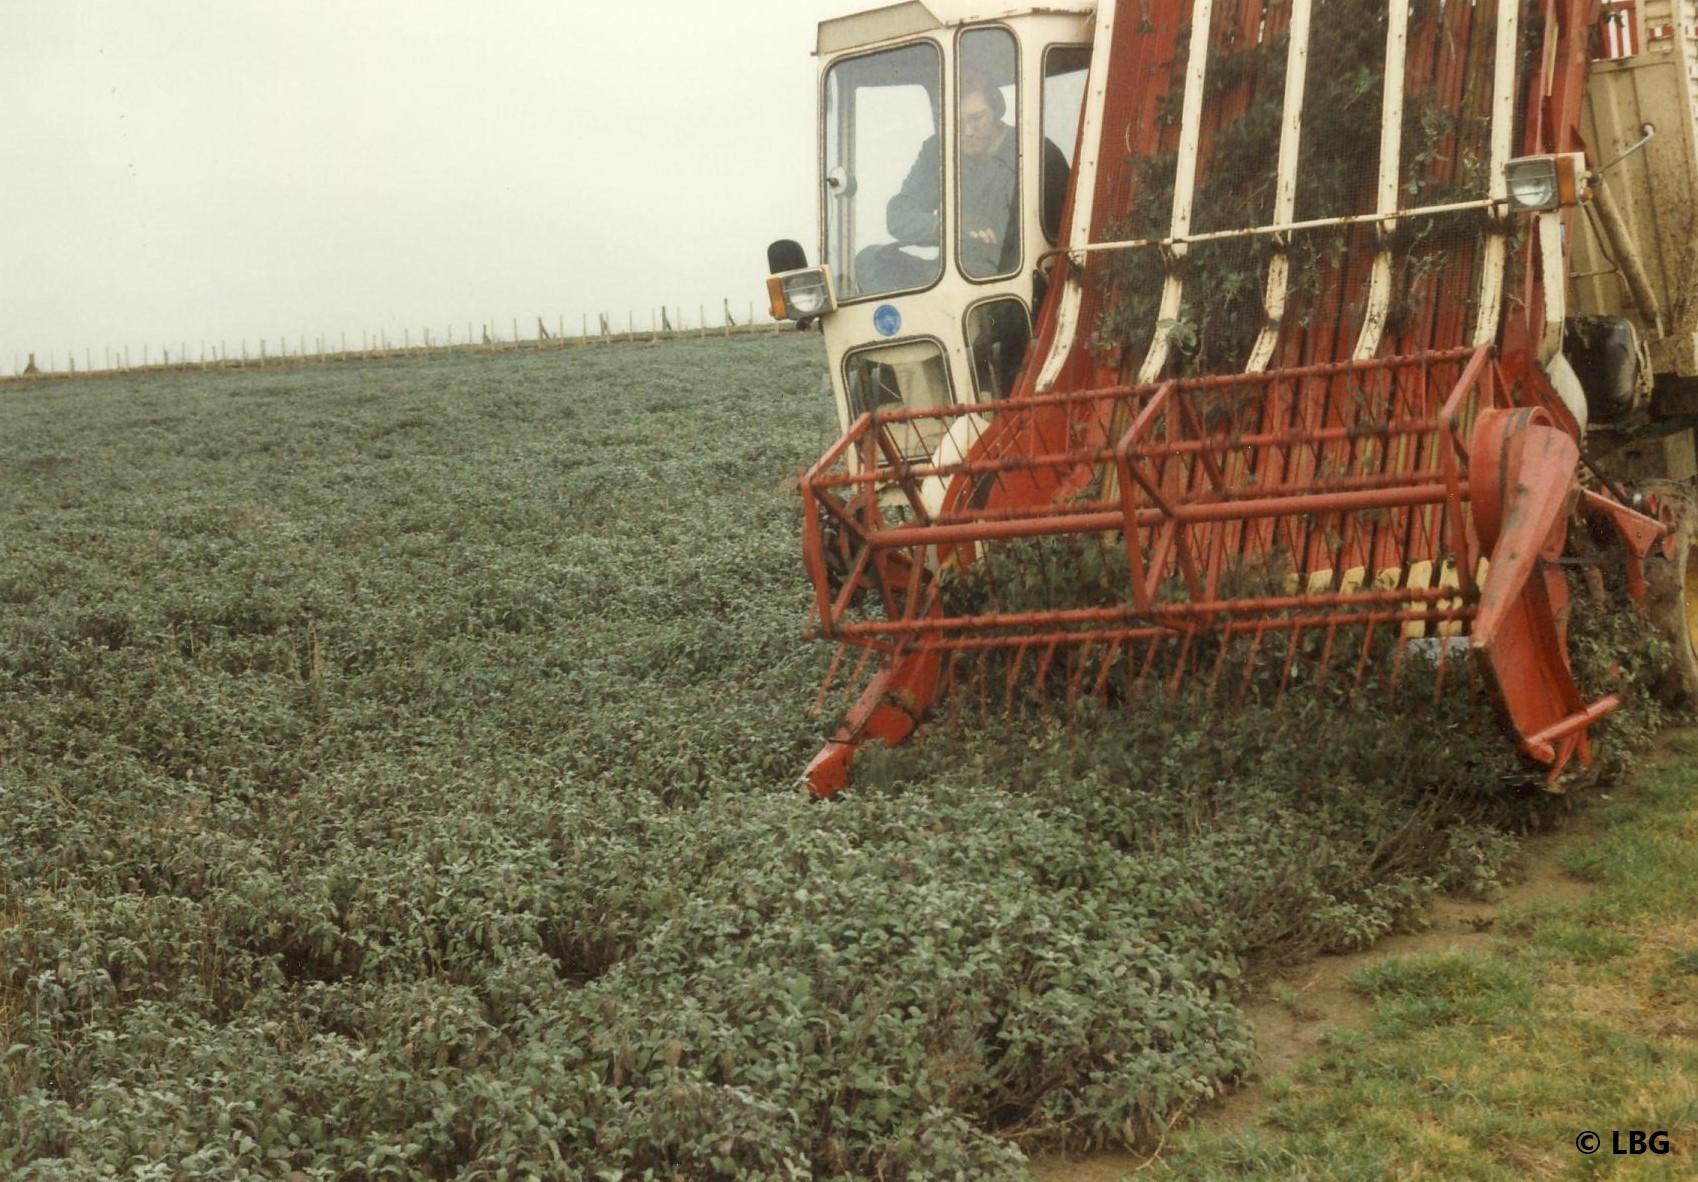 Machine harvesting sage